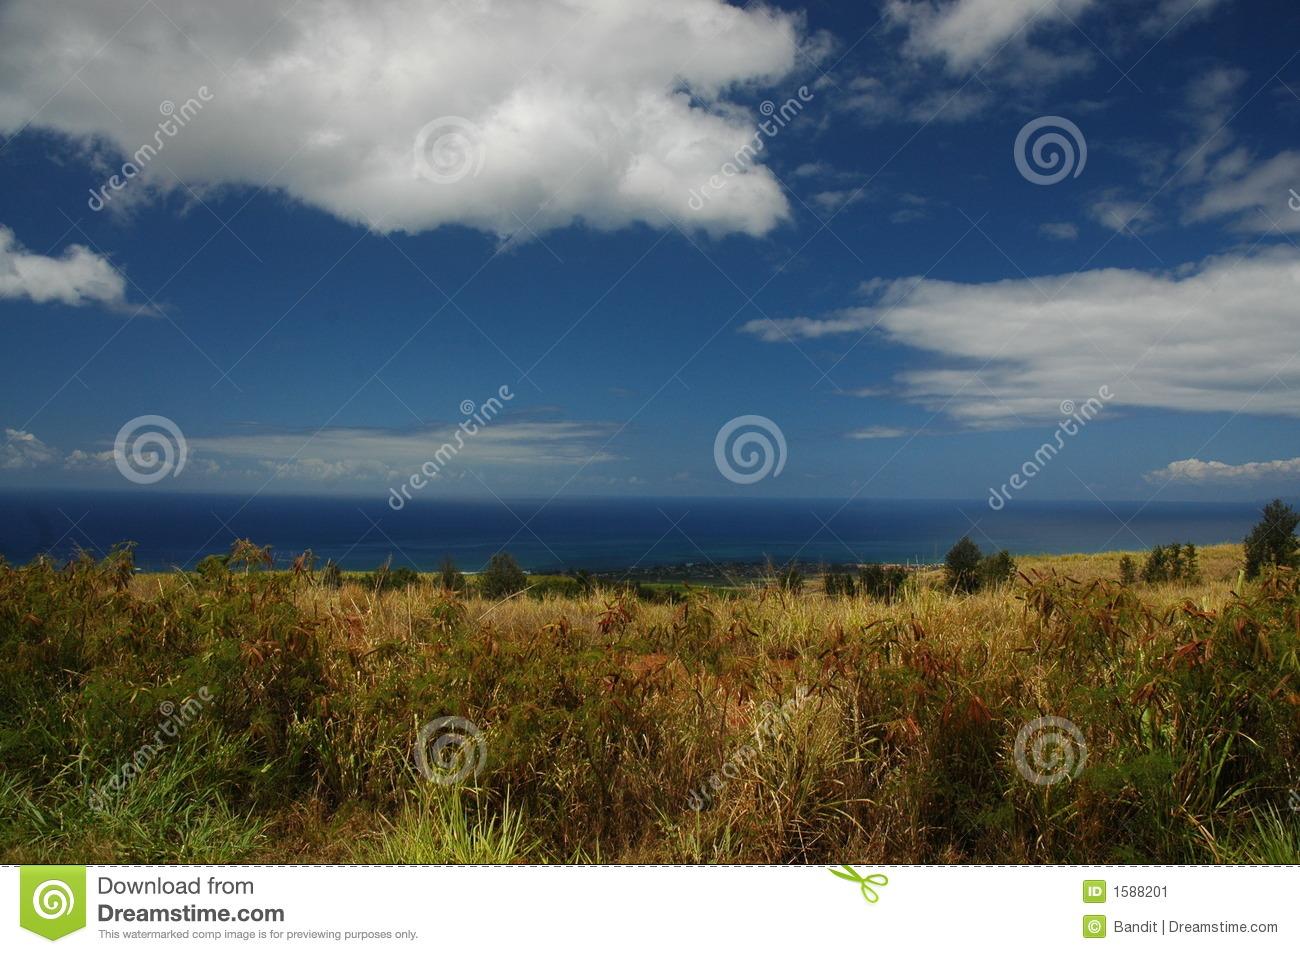 Kauai Land Sea And Sky Stock Image   Image  1588201